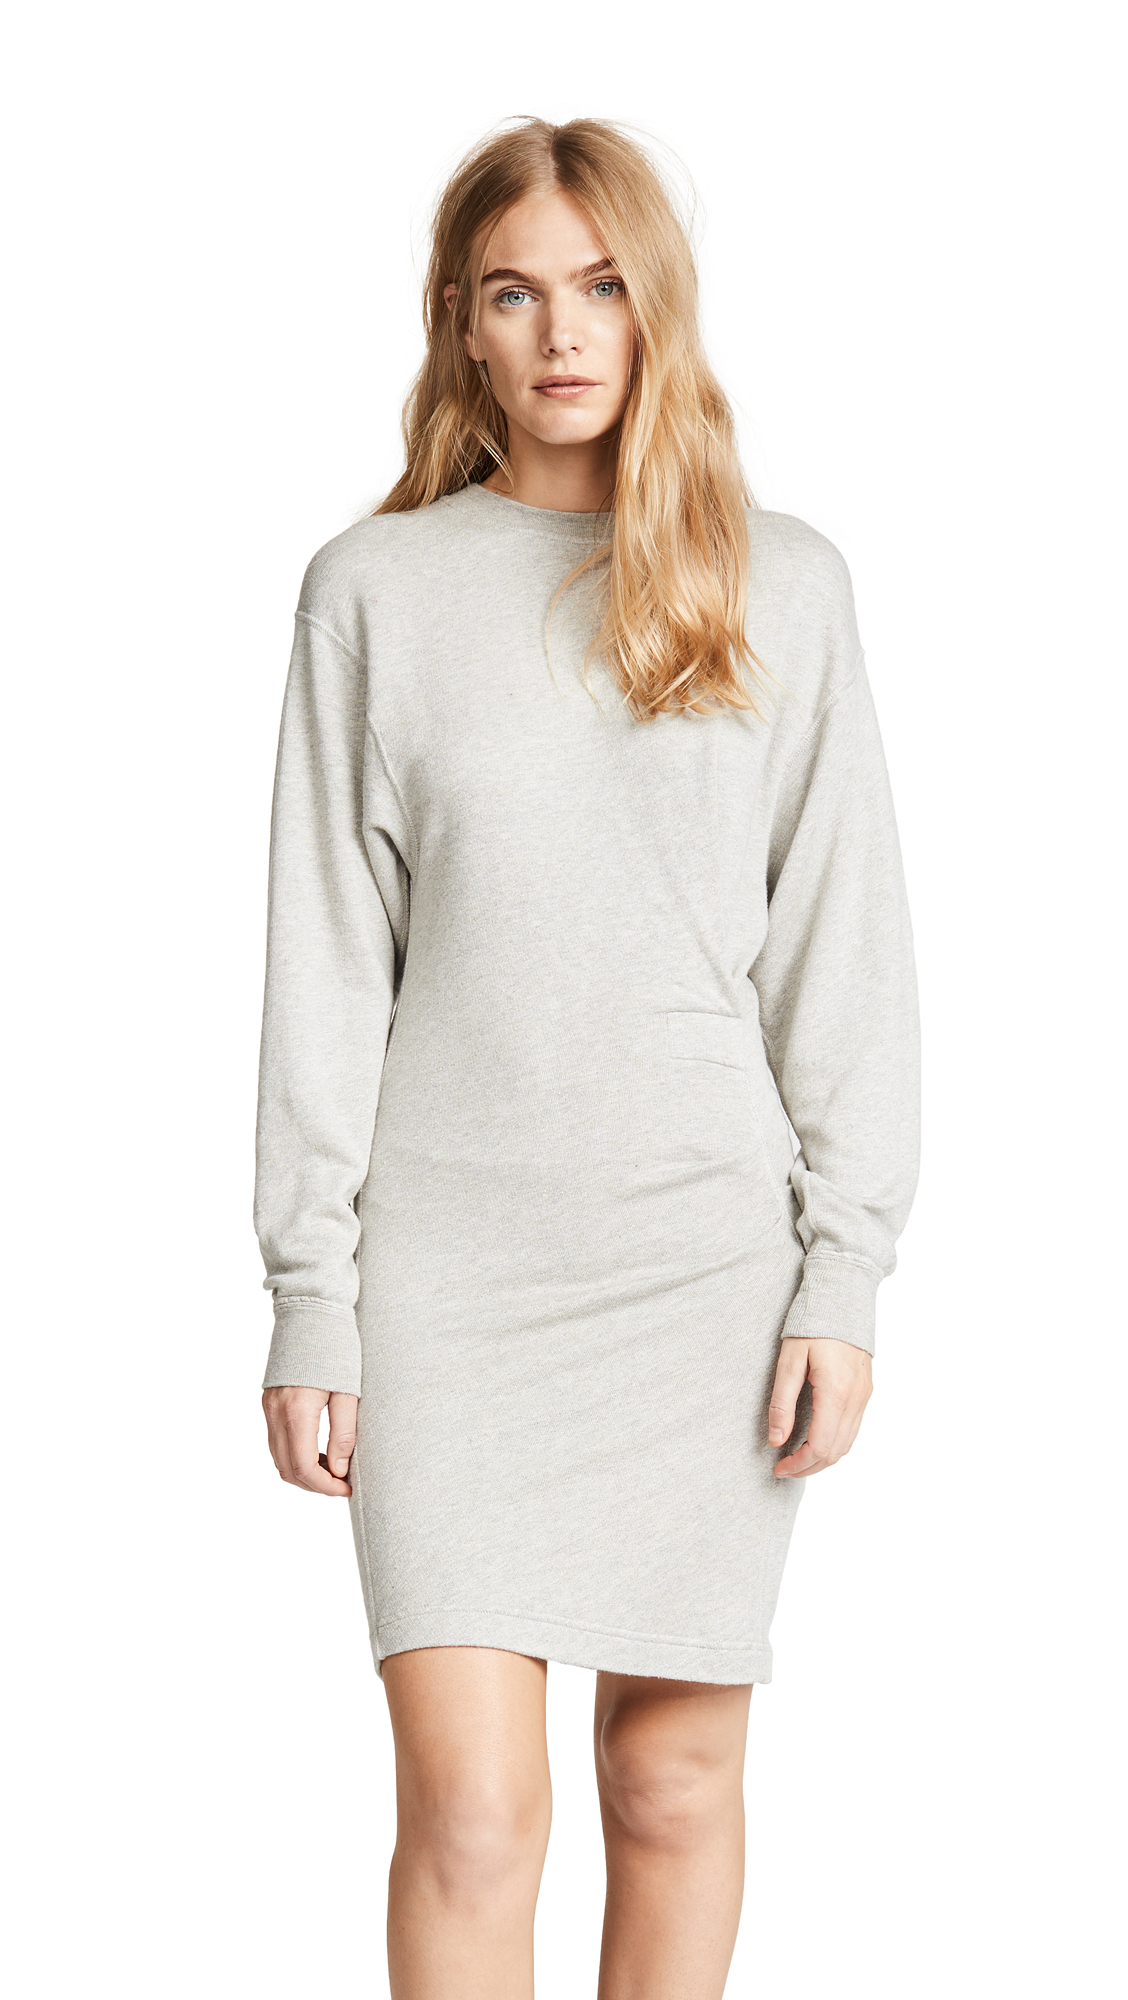 Isabel Marant Etoile Fewlyn Dress In Light Grey